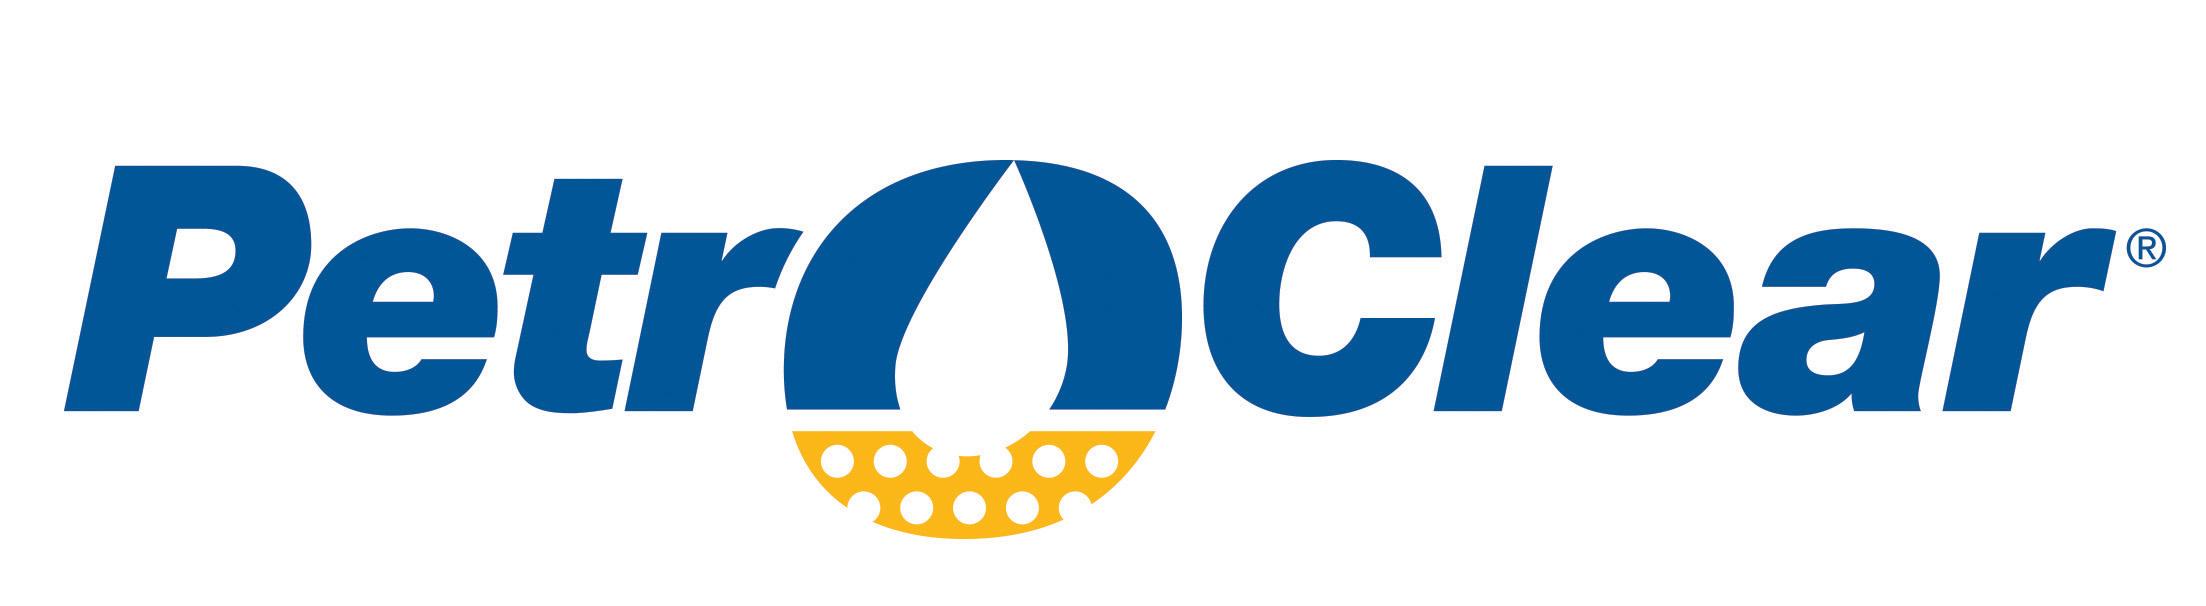 PetroClear Logo on White